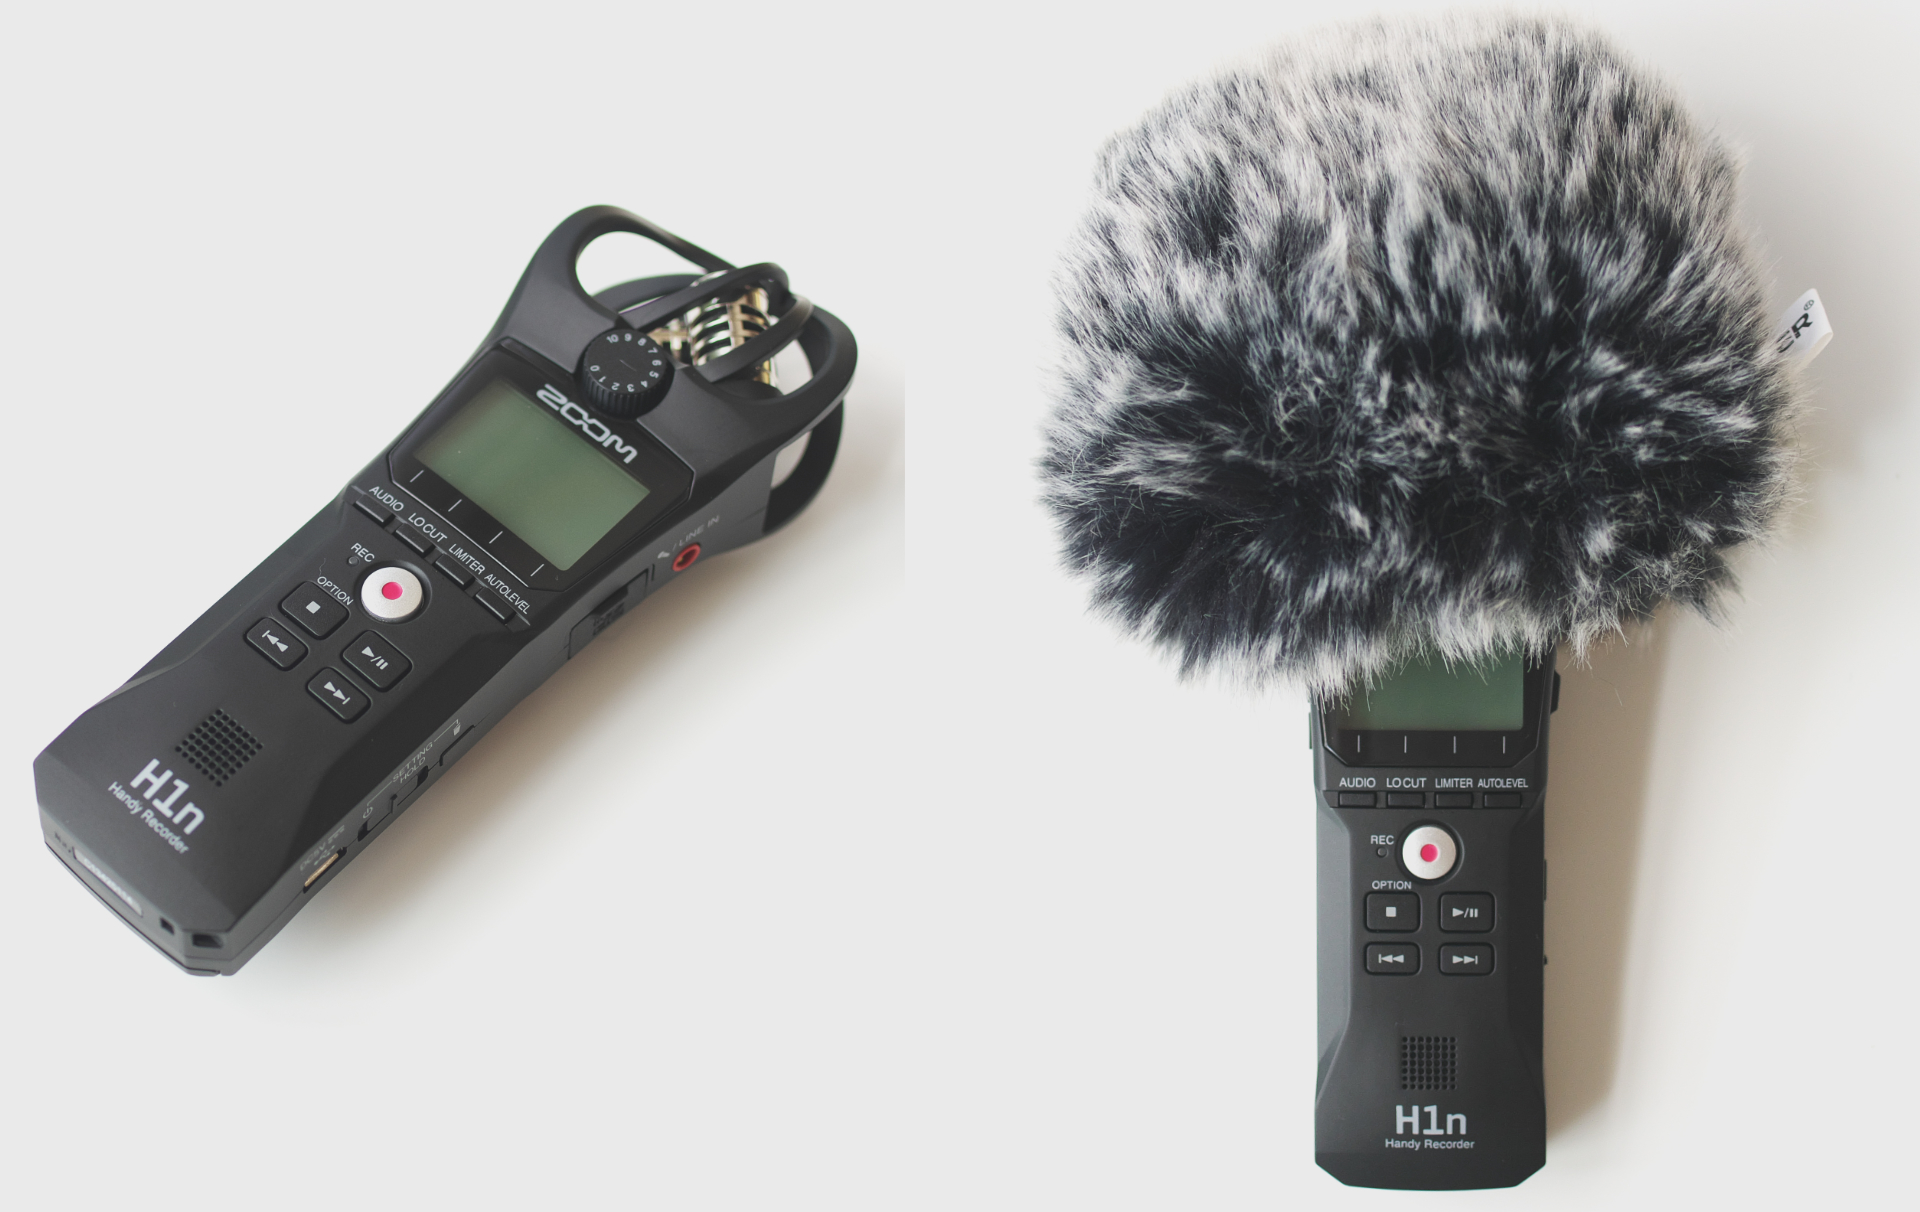 Neewer マイクウインドスクリーン ZOOM H1n ポータブルレコーダー取り付け例1